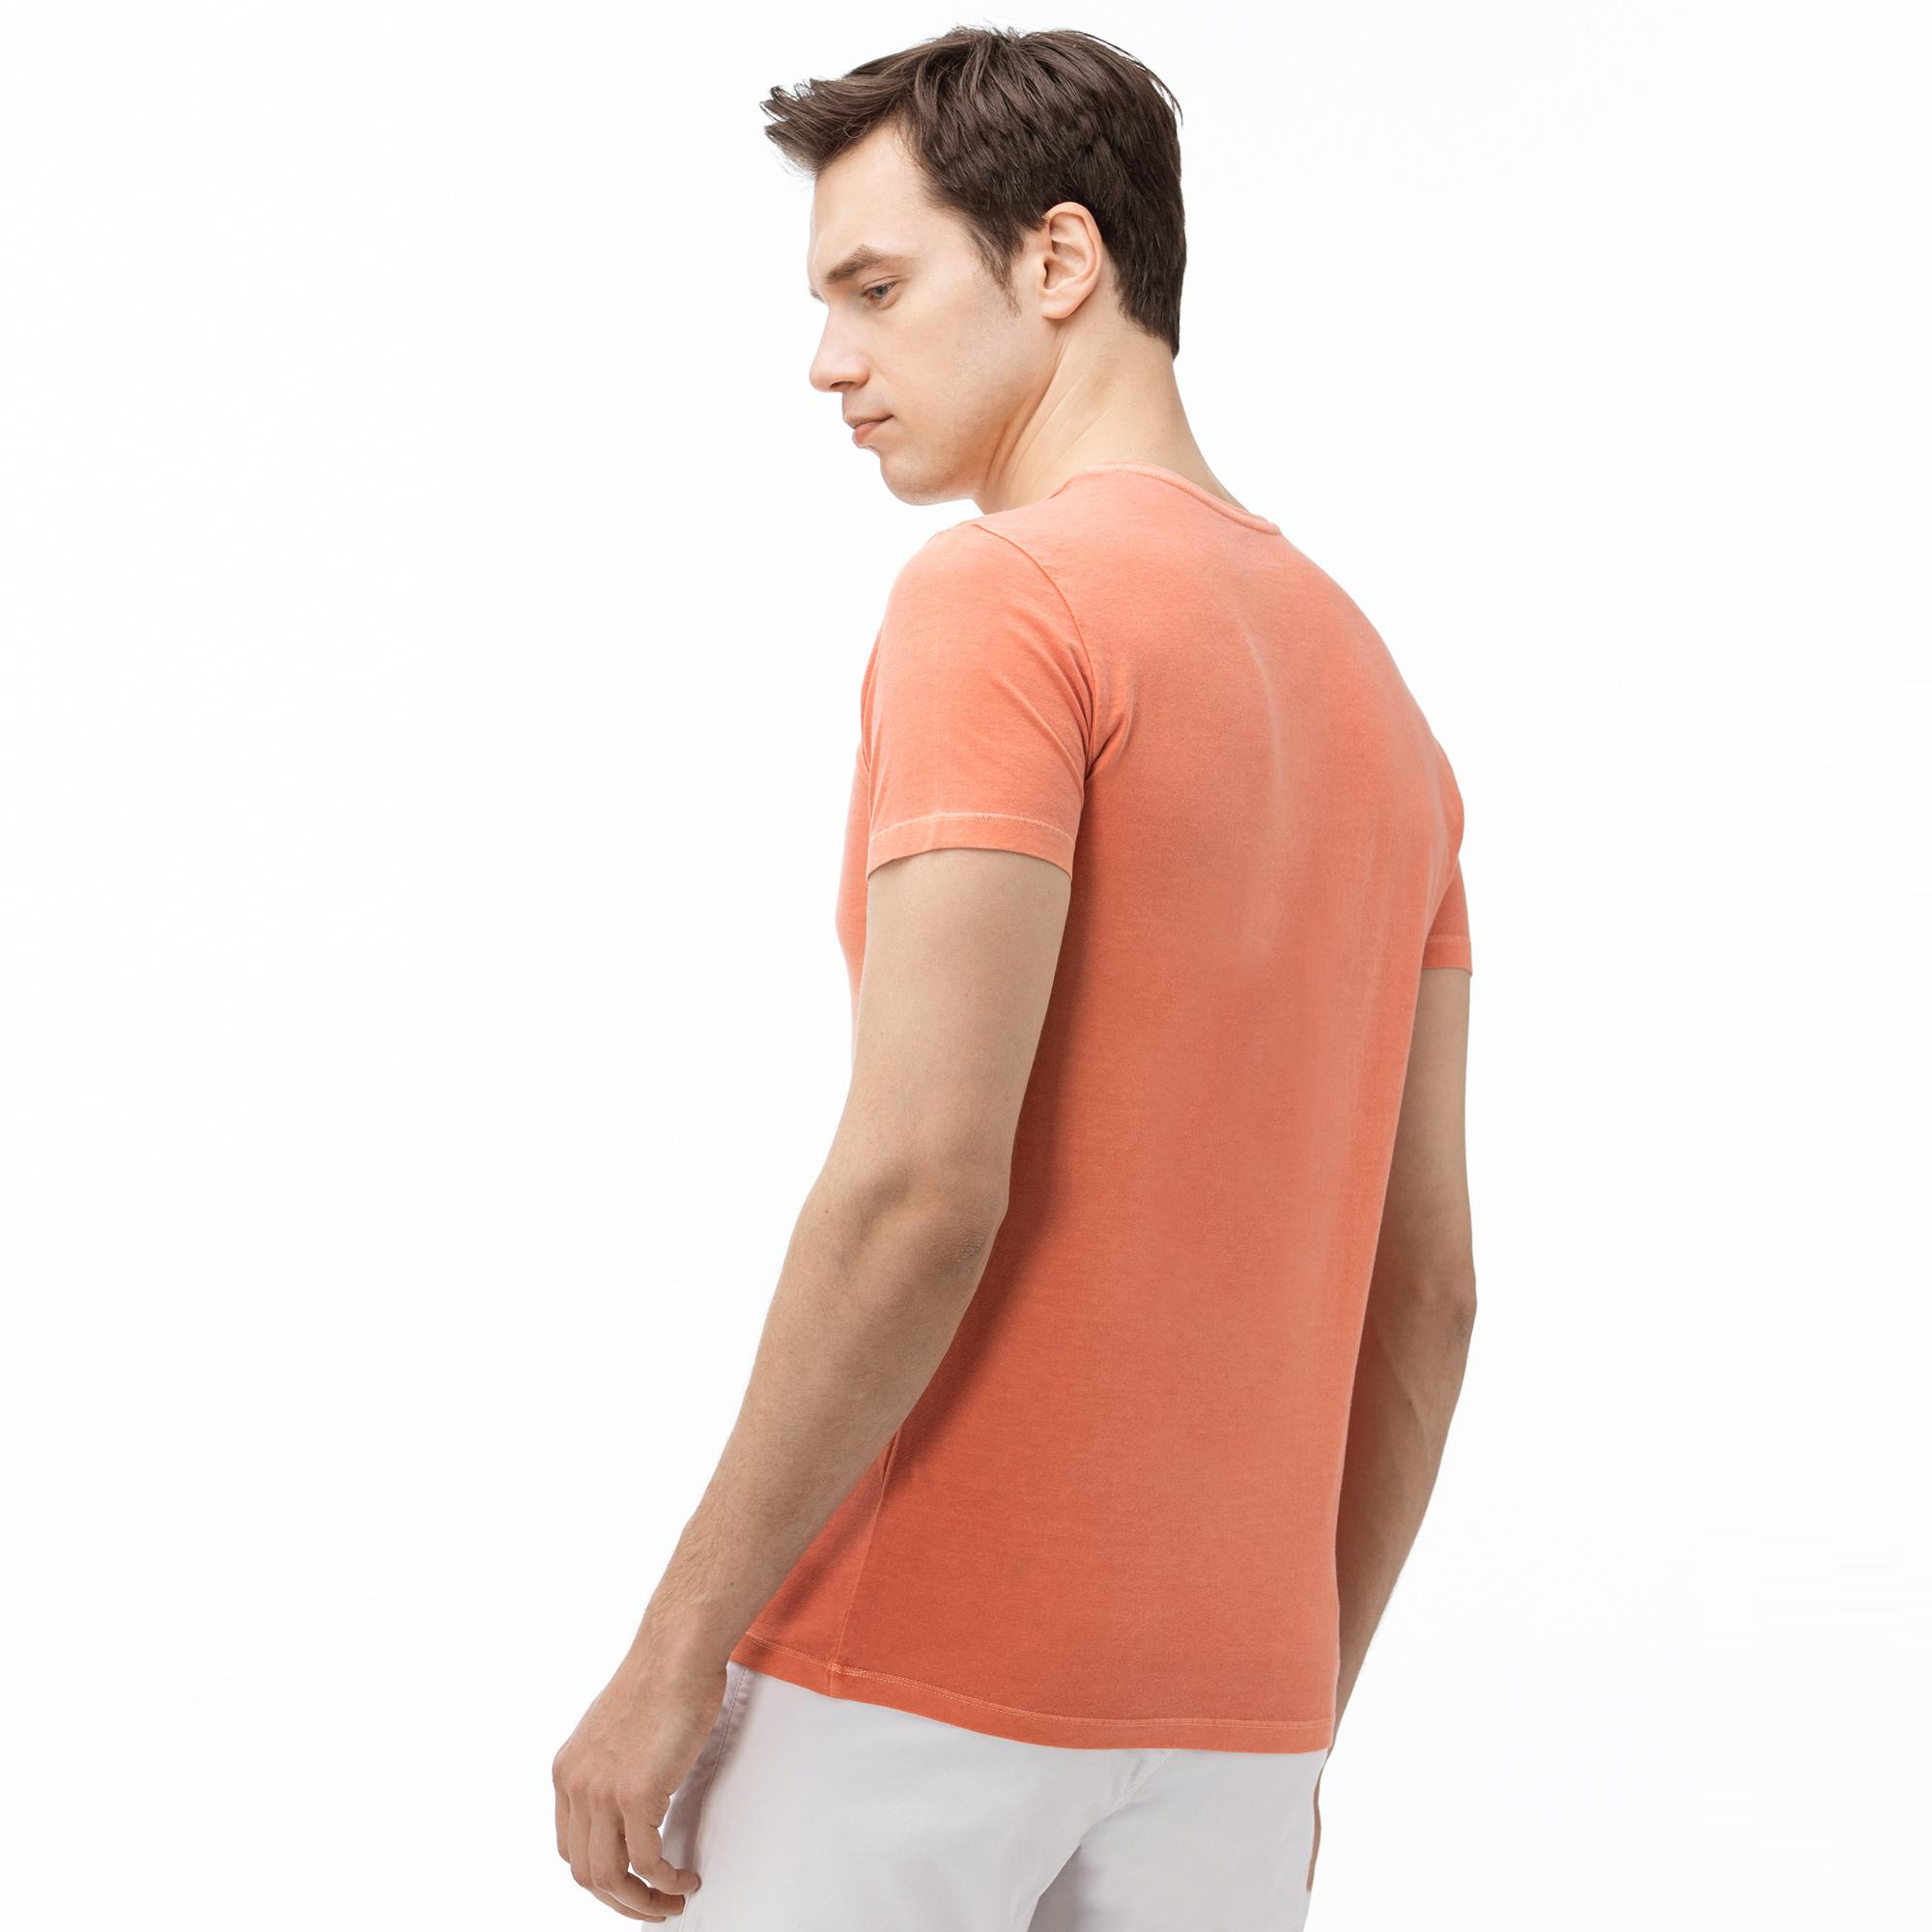 Lacoste Erkek V Yaka Açık Pembe T-Shirt